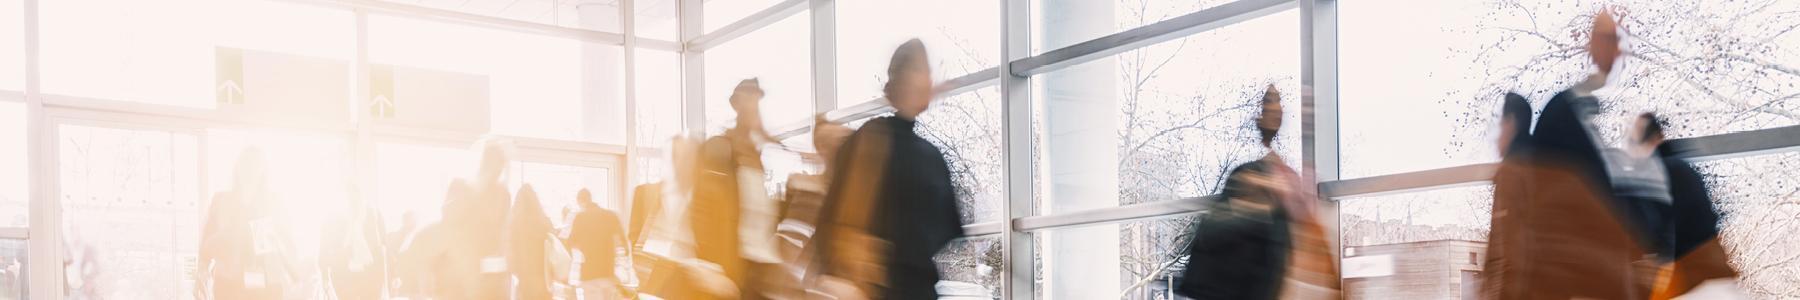 Joseph Belfatto: Why I Became A Financial Advisor Thumbnail